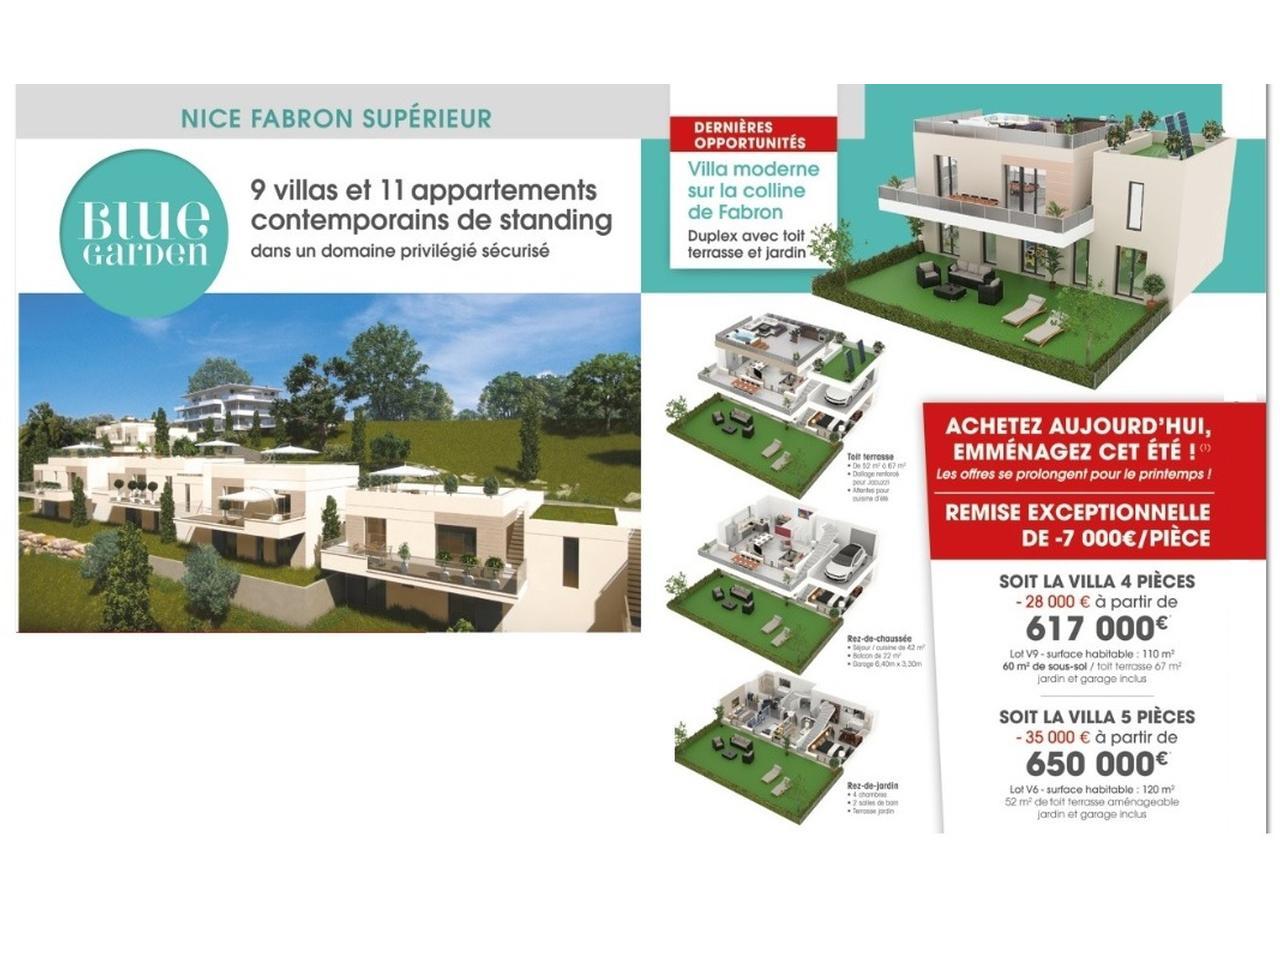 immobilier nice vue mer maison nice villa programme neuf vefa nice ouest blue garden. Black Bedroom Furniture Sets. Home Design Ideas